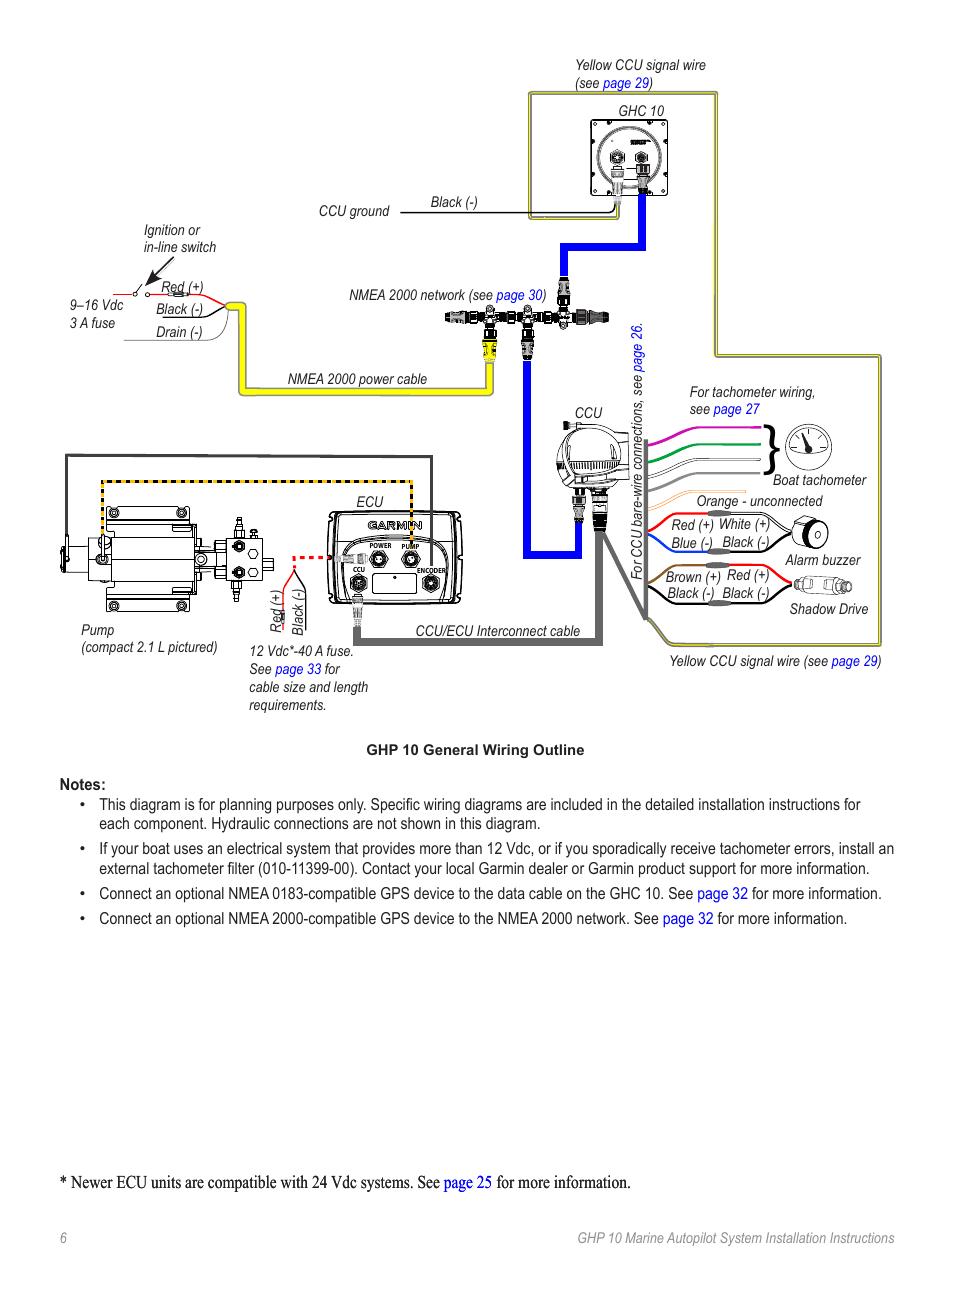 medium resolution of garmin nmea 0183 19 pin wiring diagram garmin gps wiring garmin nmea 0183 wiring diagram to simrad garmin chartplotter wiring diagram